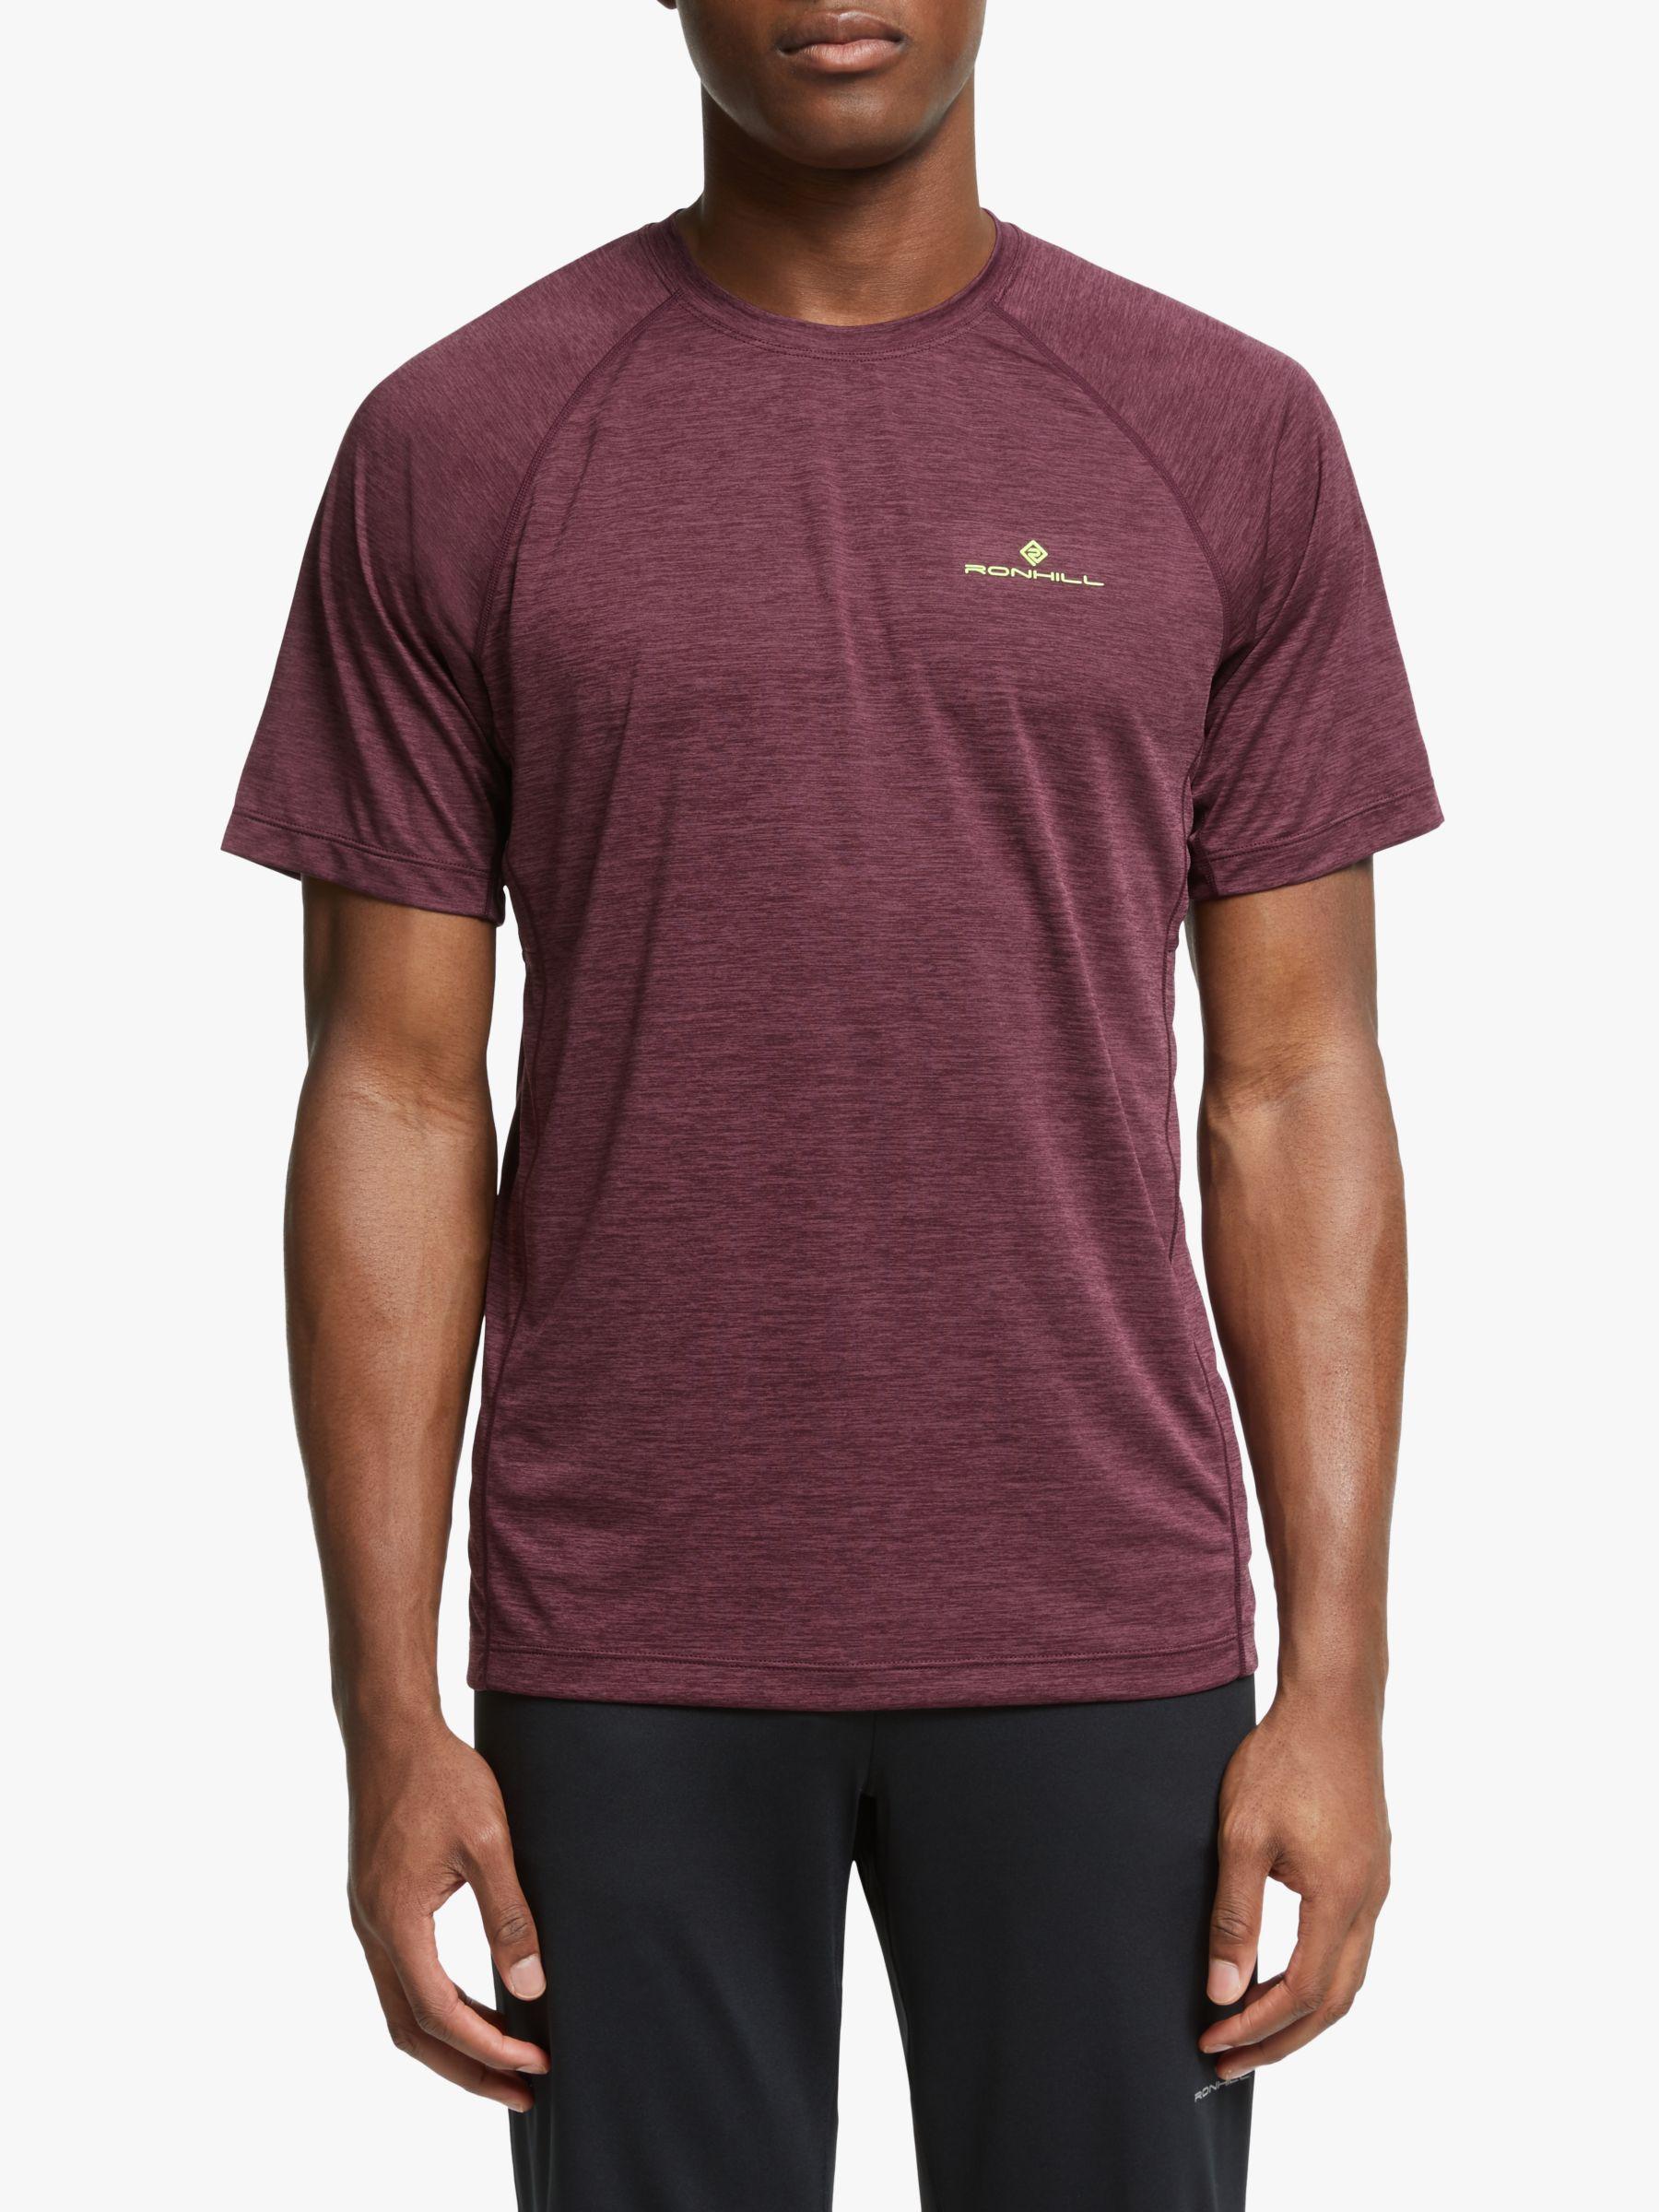 Ronhill Mens Mens Momentum S//S Tee Short Sleeve T-Shirts